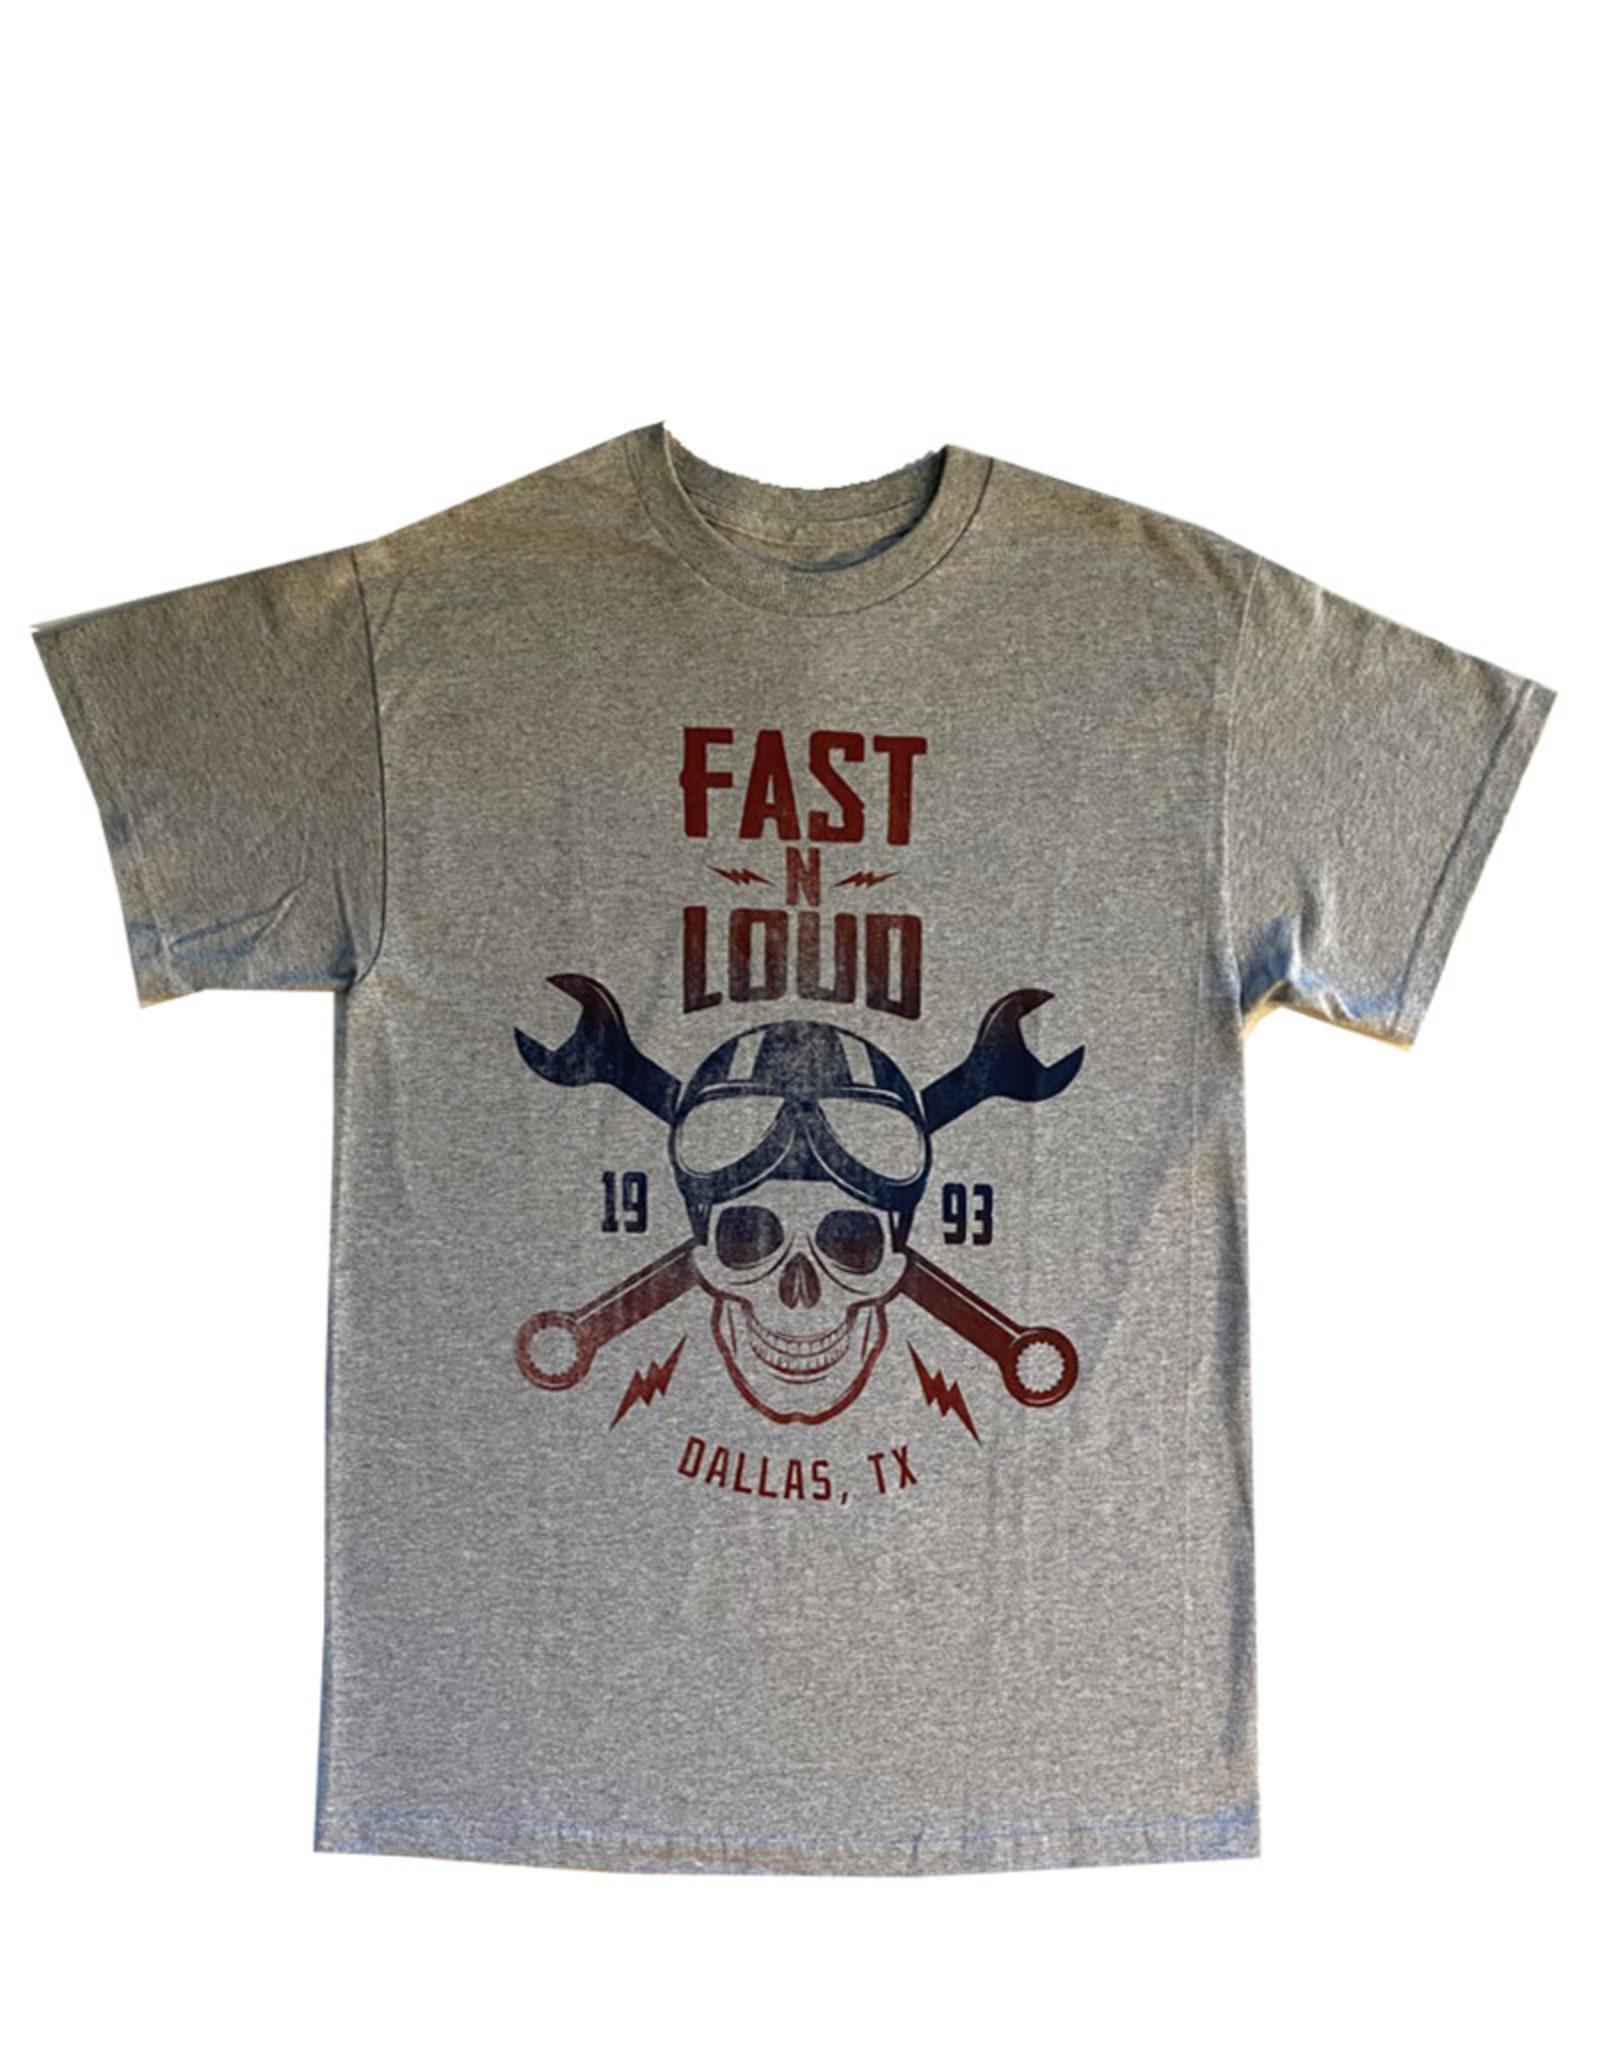 Fast n loud ( T-shirt ) Skull